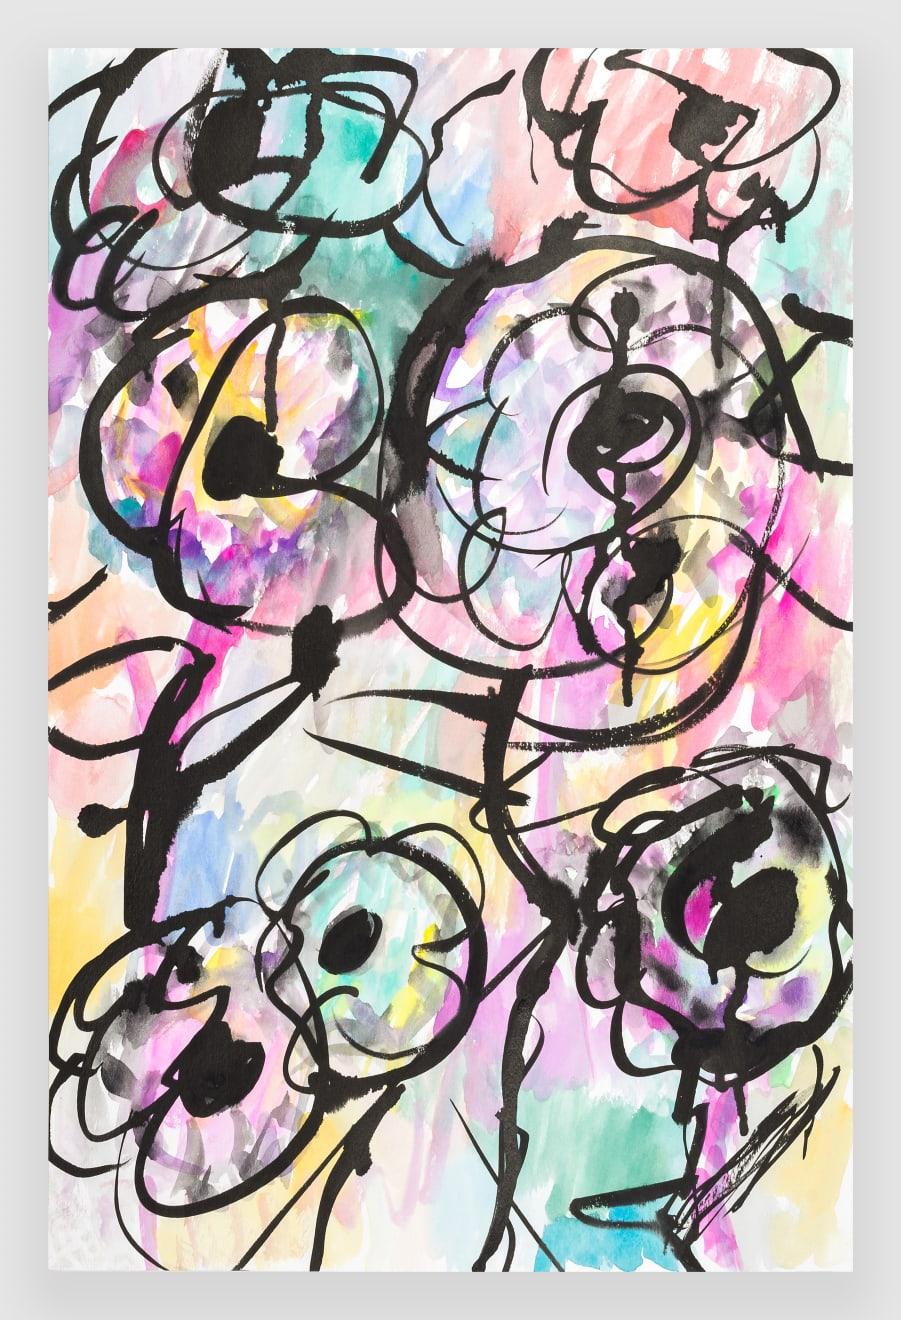 Rob Ventura, Untitled, 2016